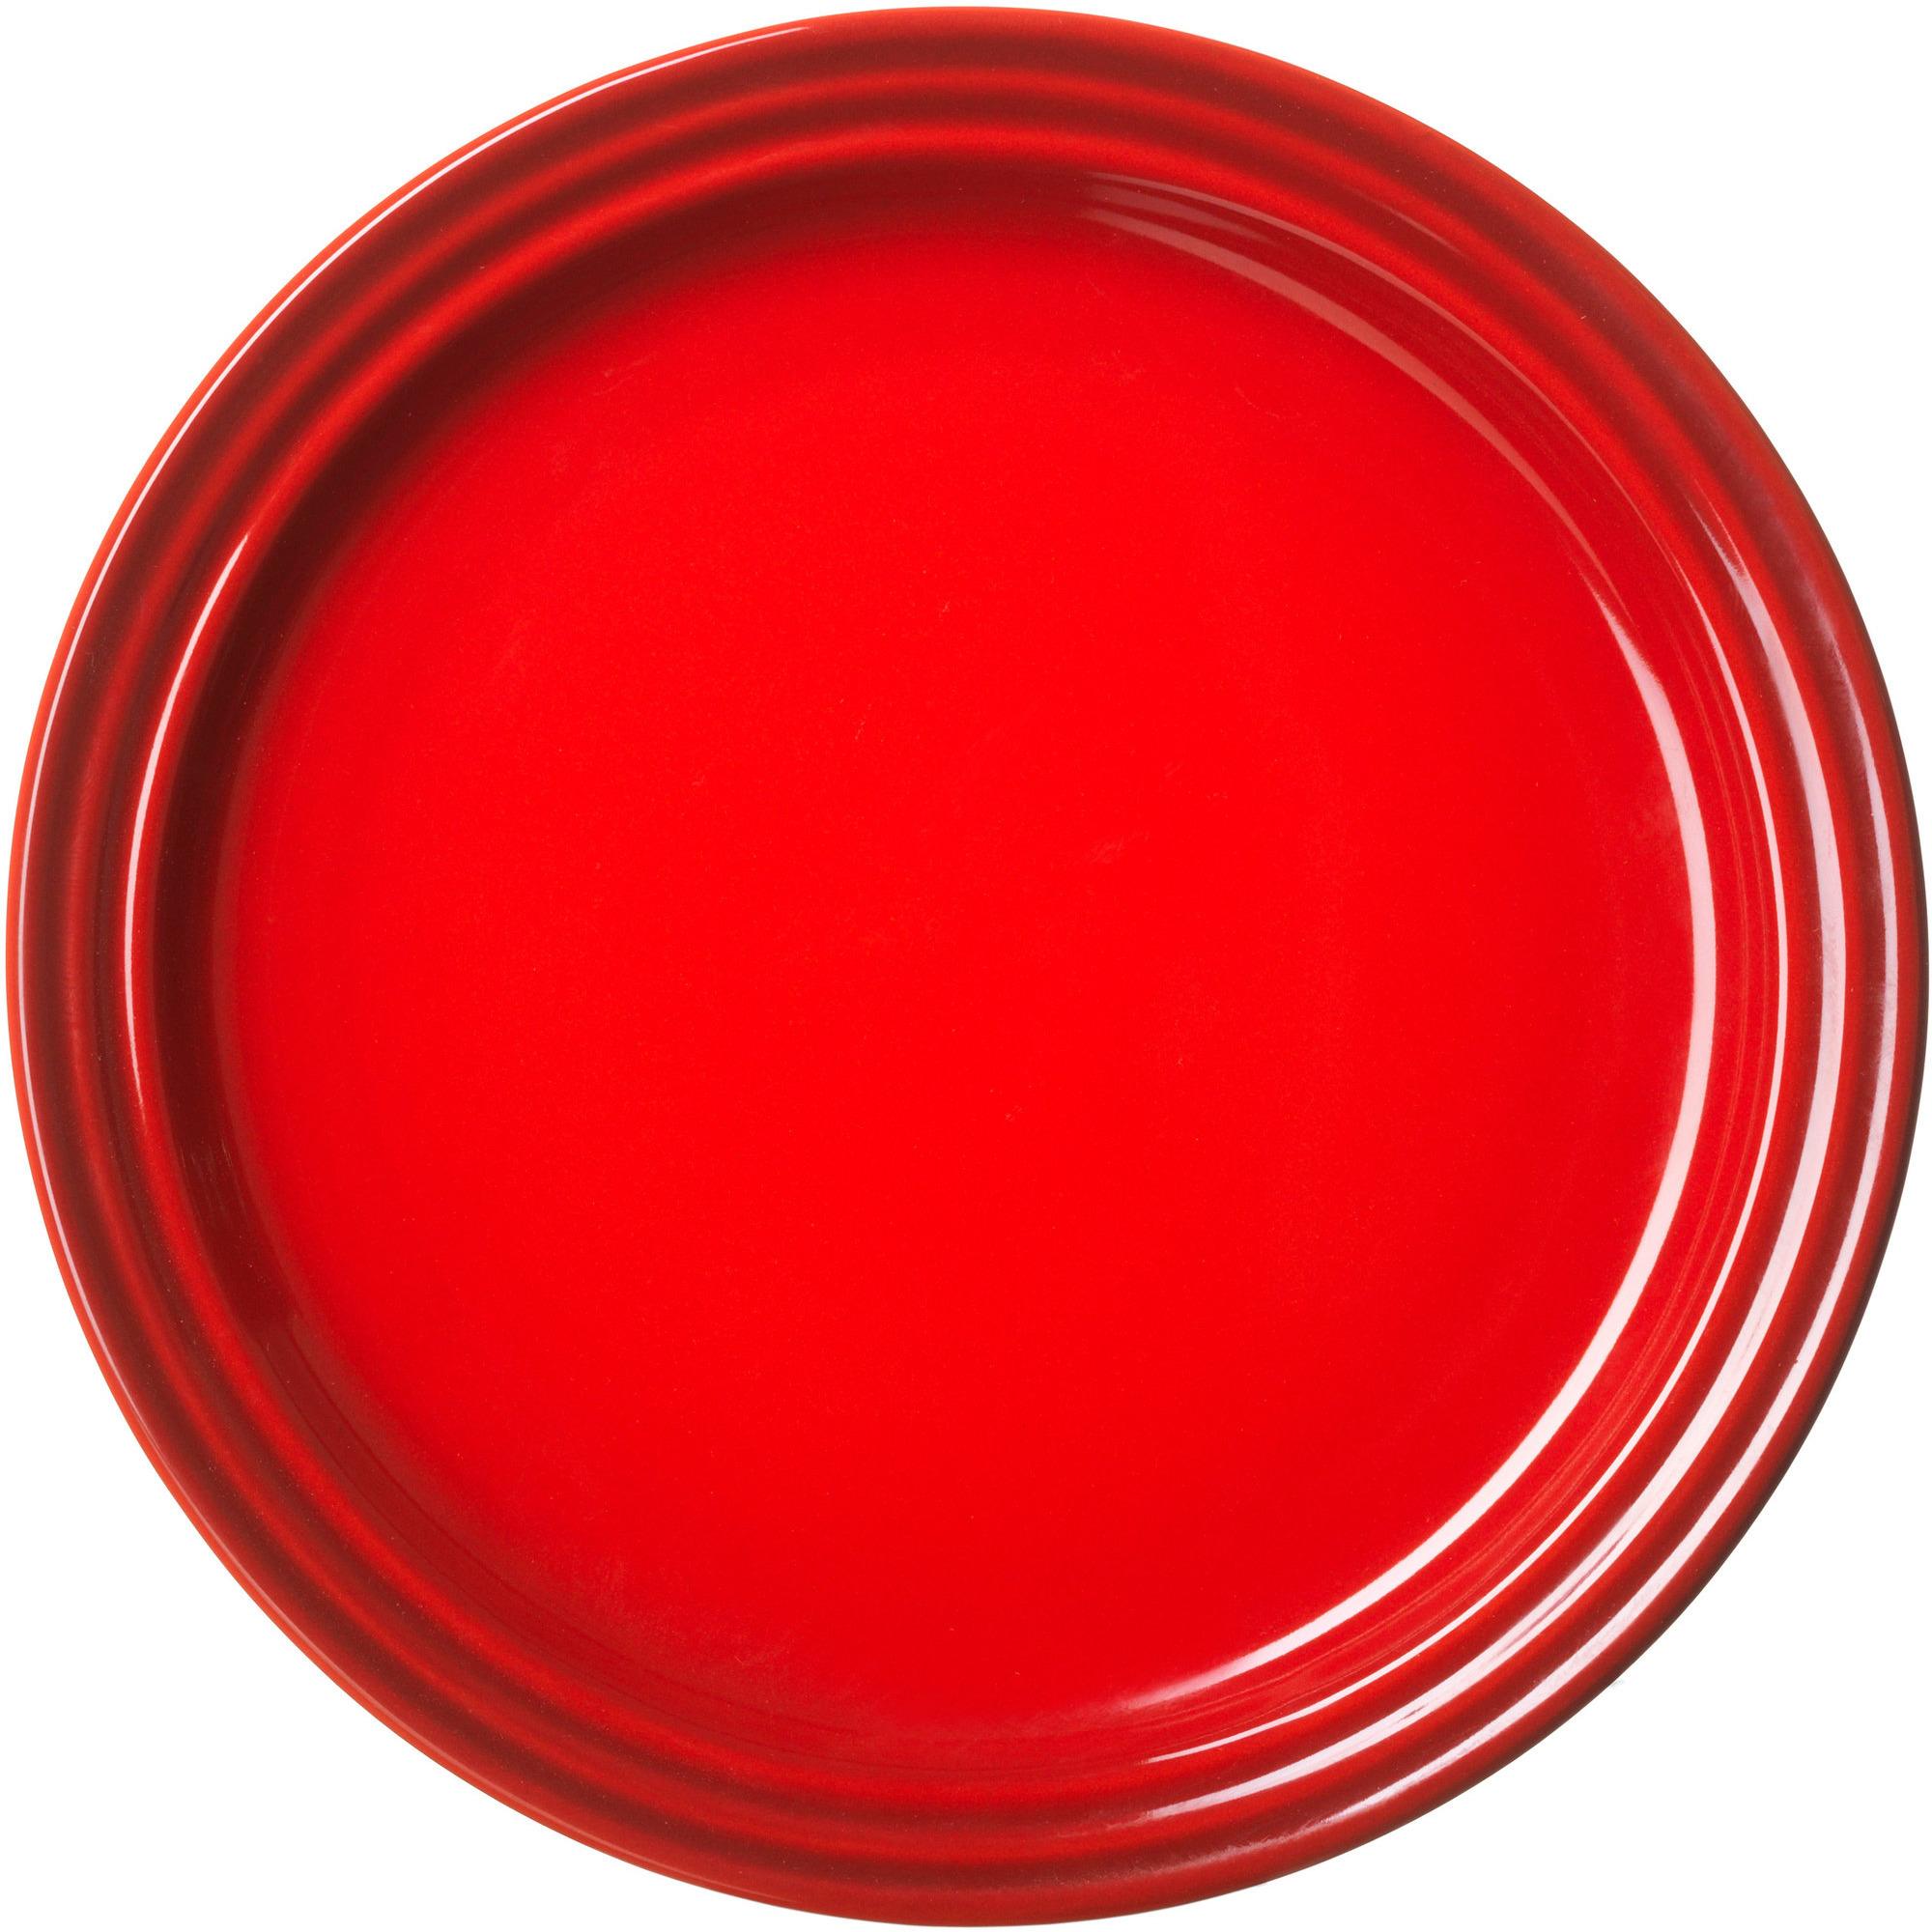 Le Creuset Lunchtallrik 23 cm Röd